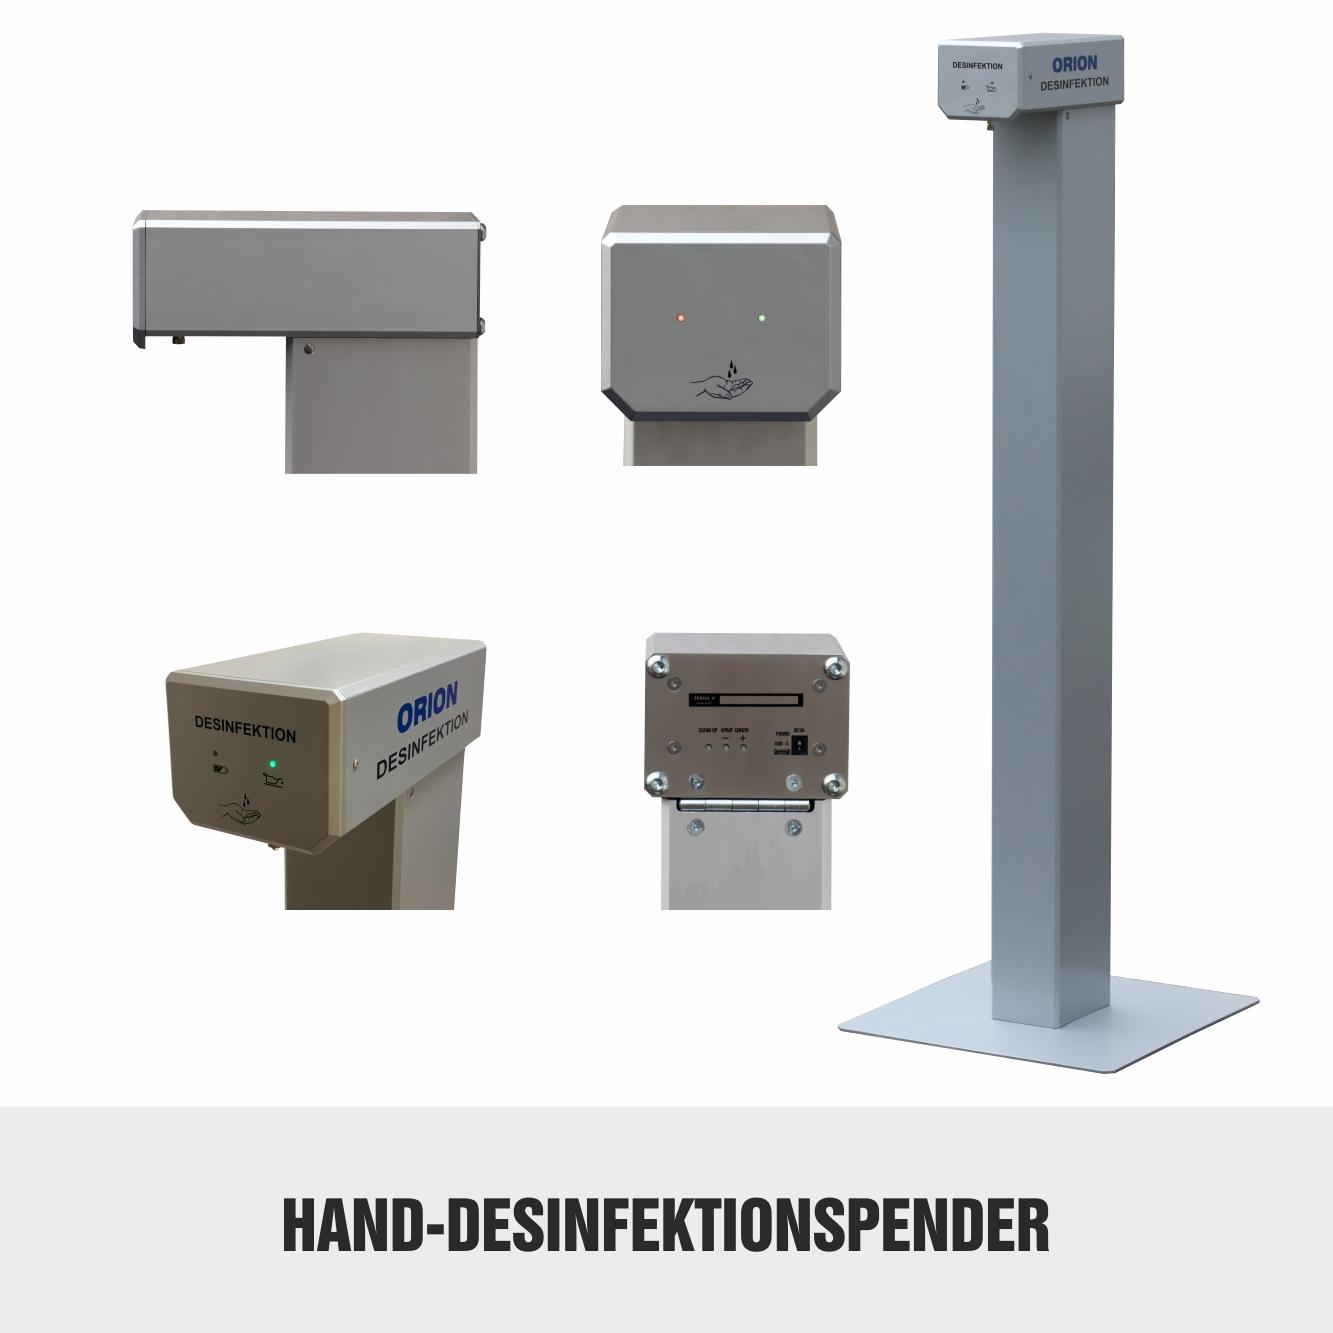 Hand - Desinfektion-spender